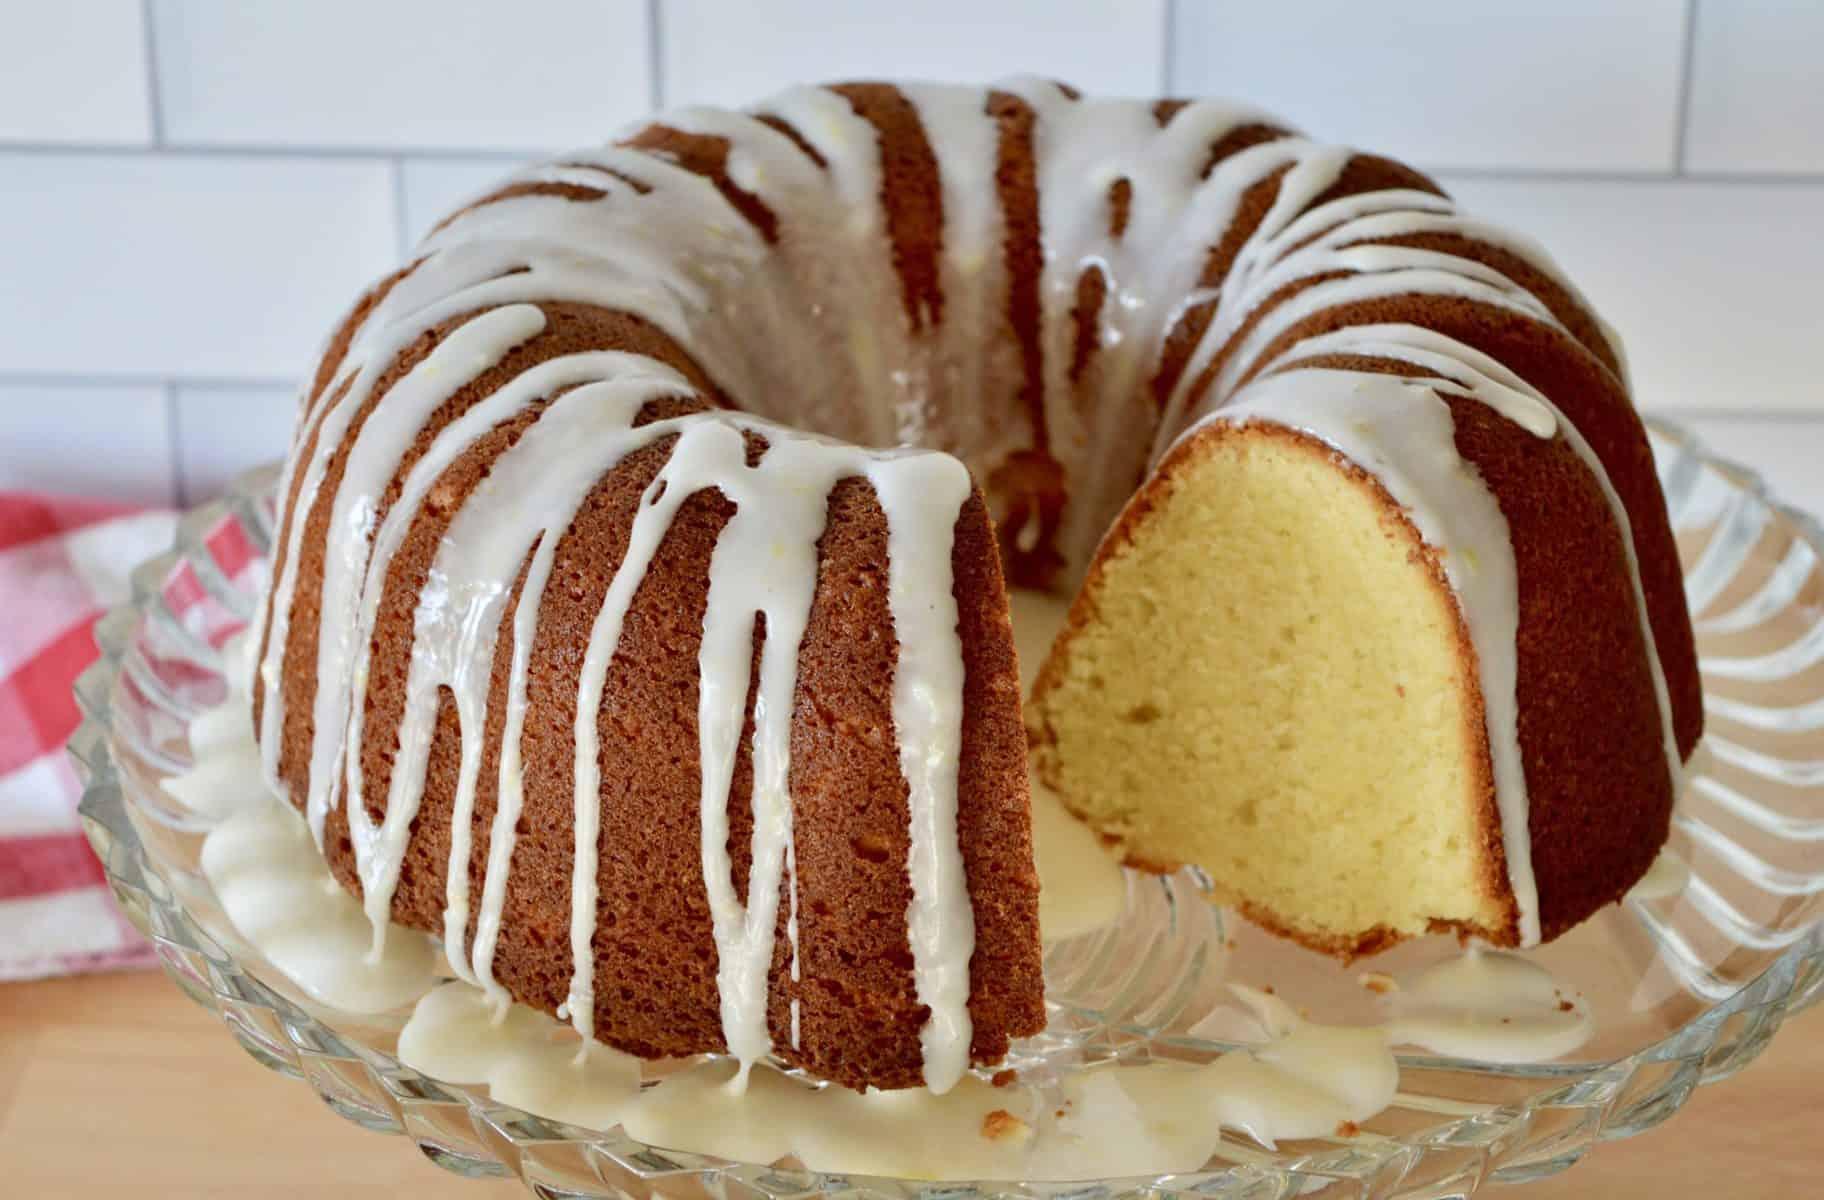 Lemon Olive Oil Bundt Cake with honey lemon glaze on a glass pedestal.